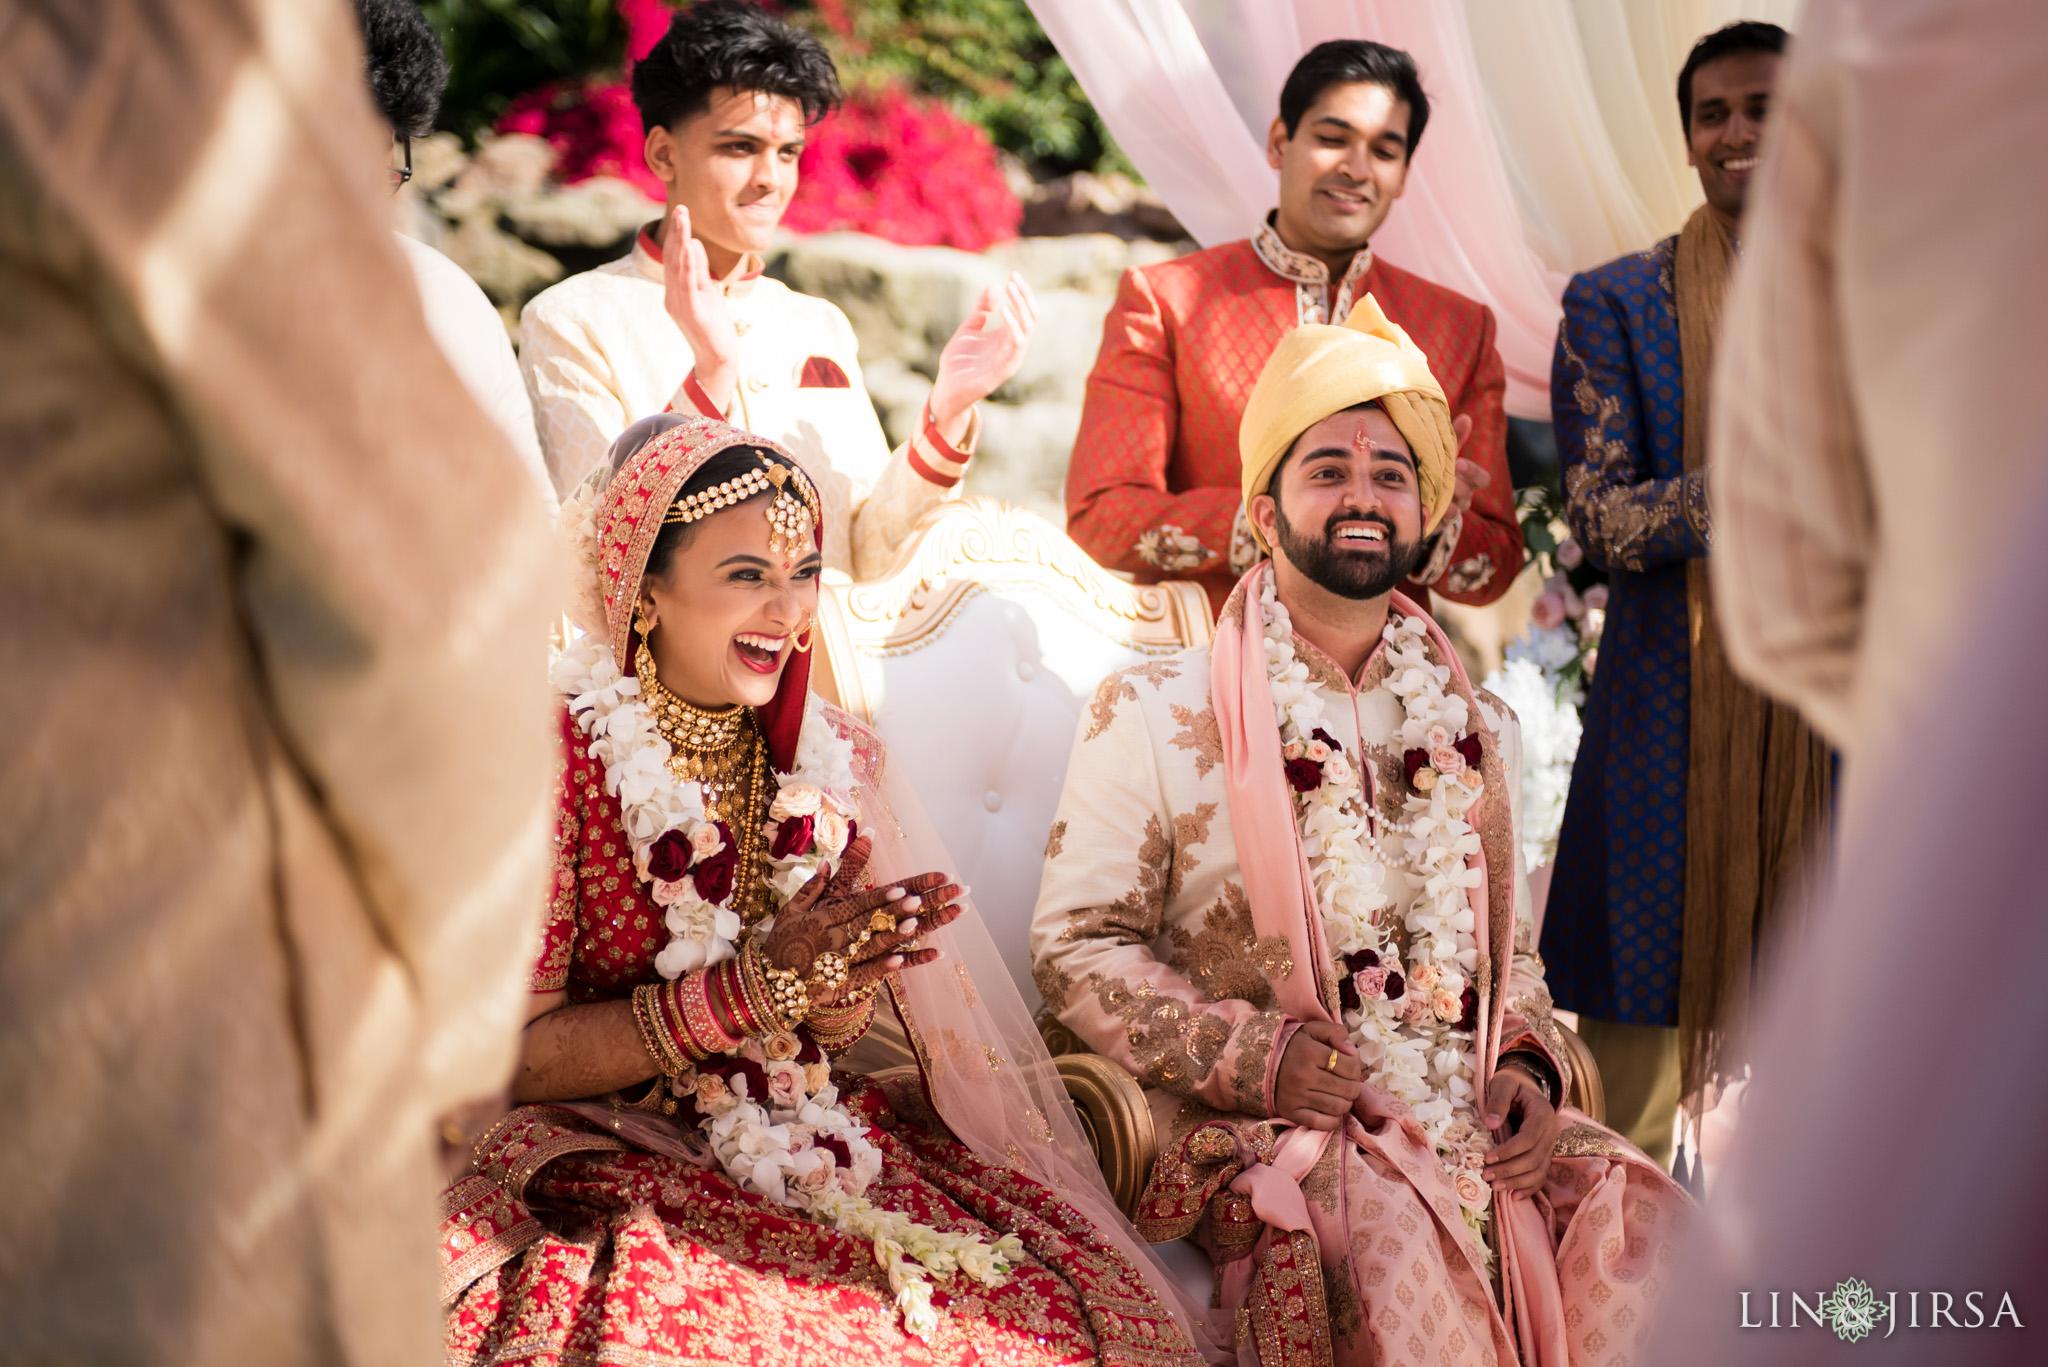 35 four seasons westlake village indian wedding ceremony photography